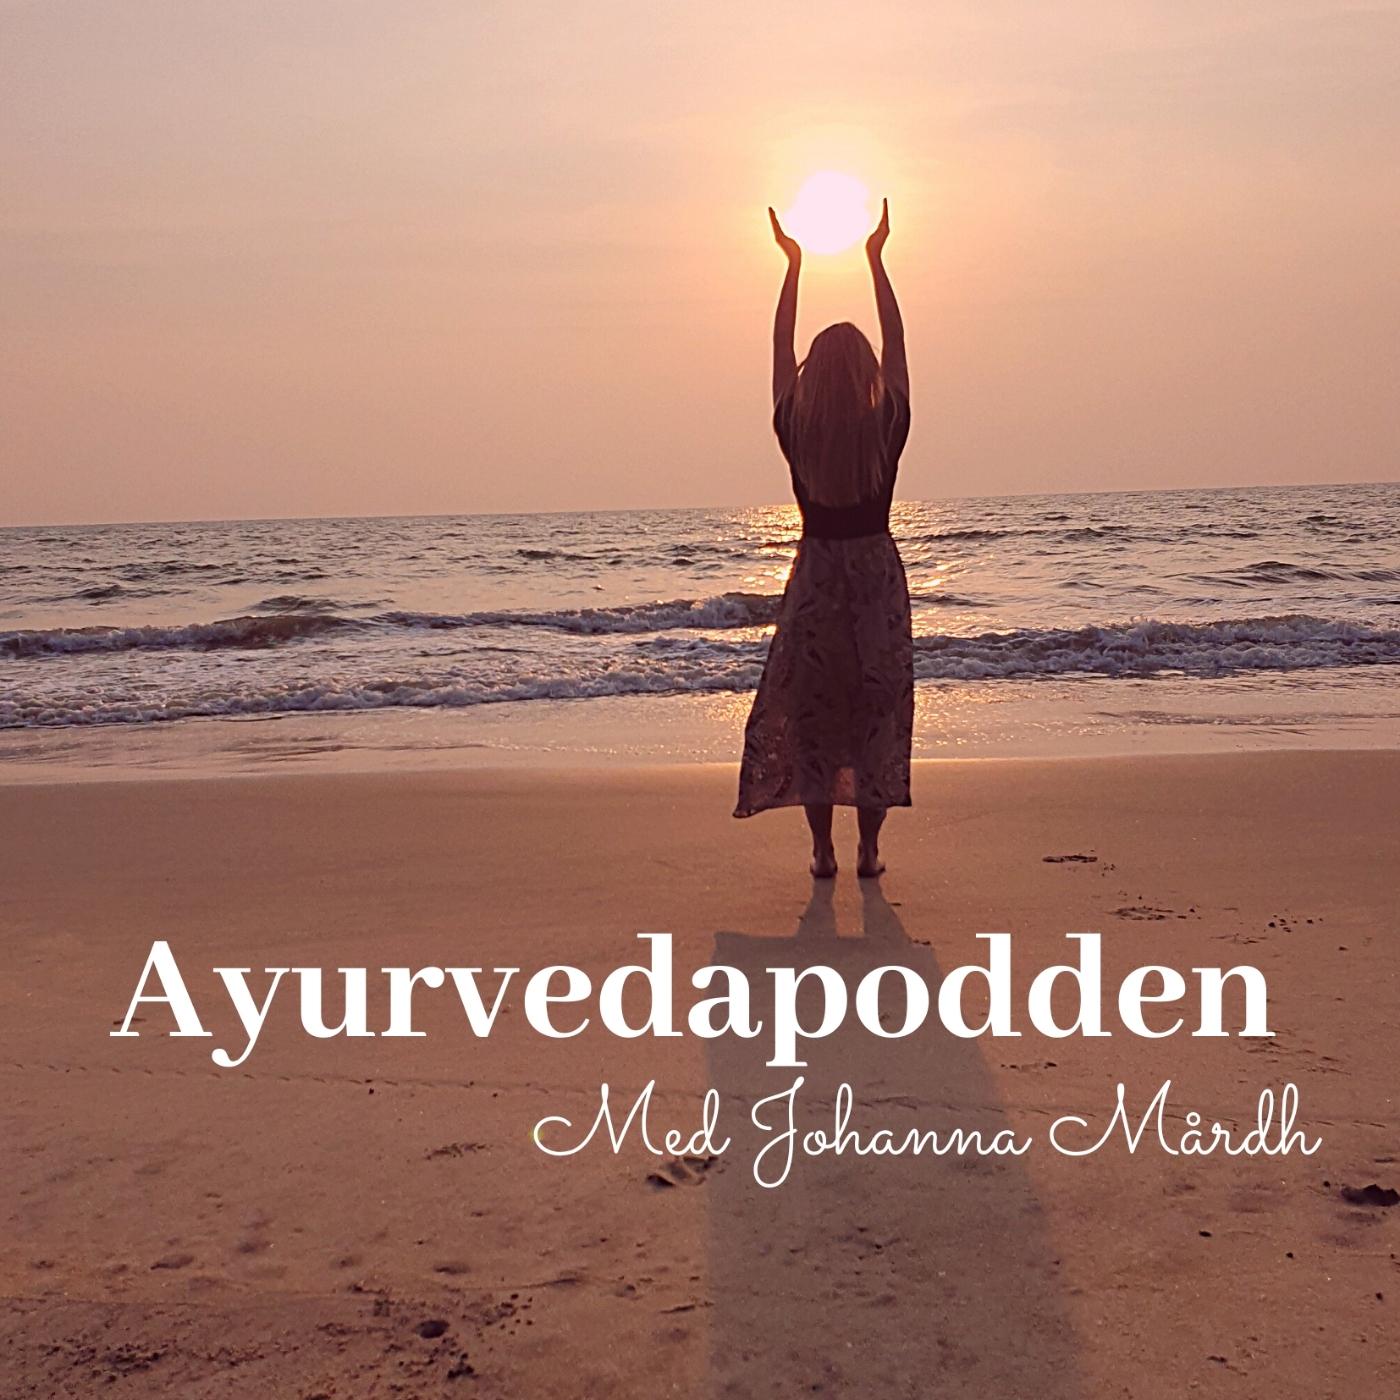 Ayurvedapodden - Teaser